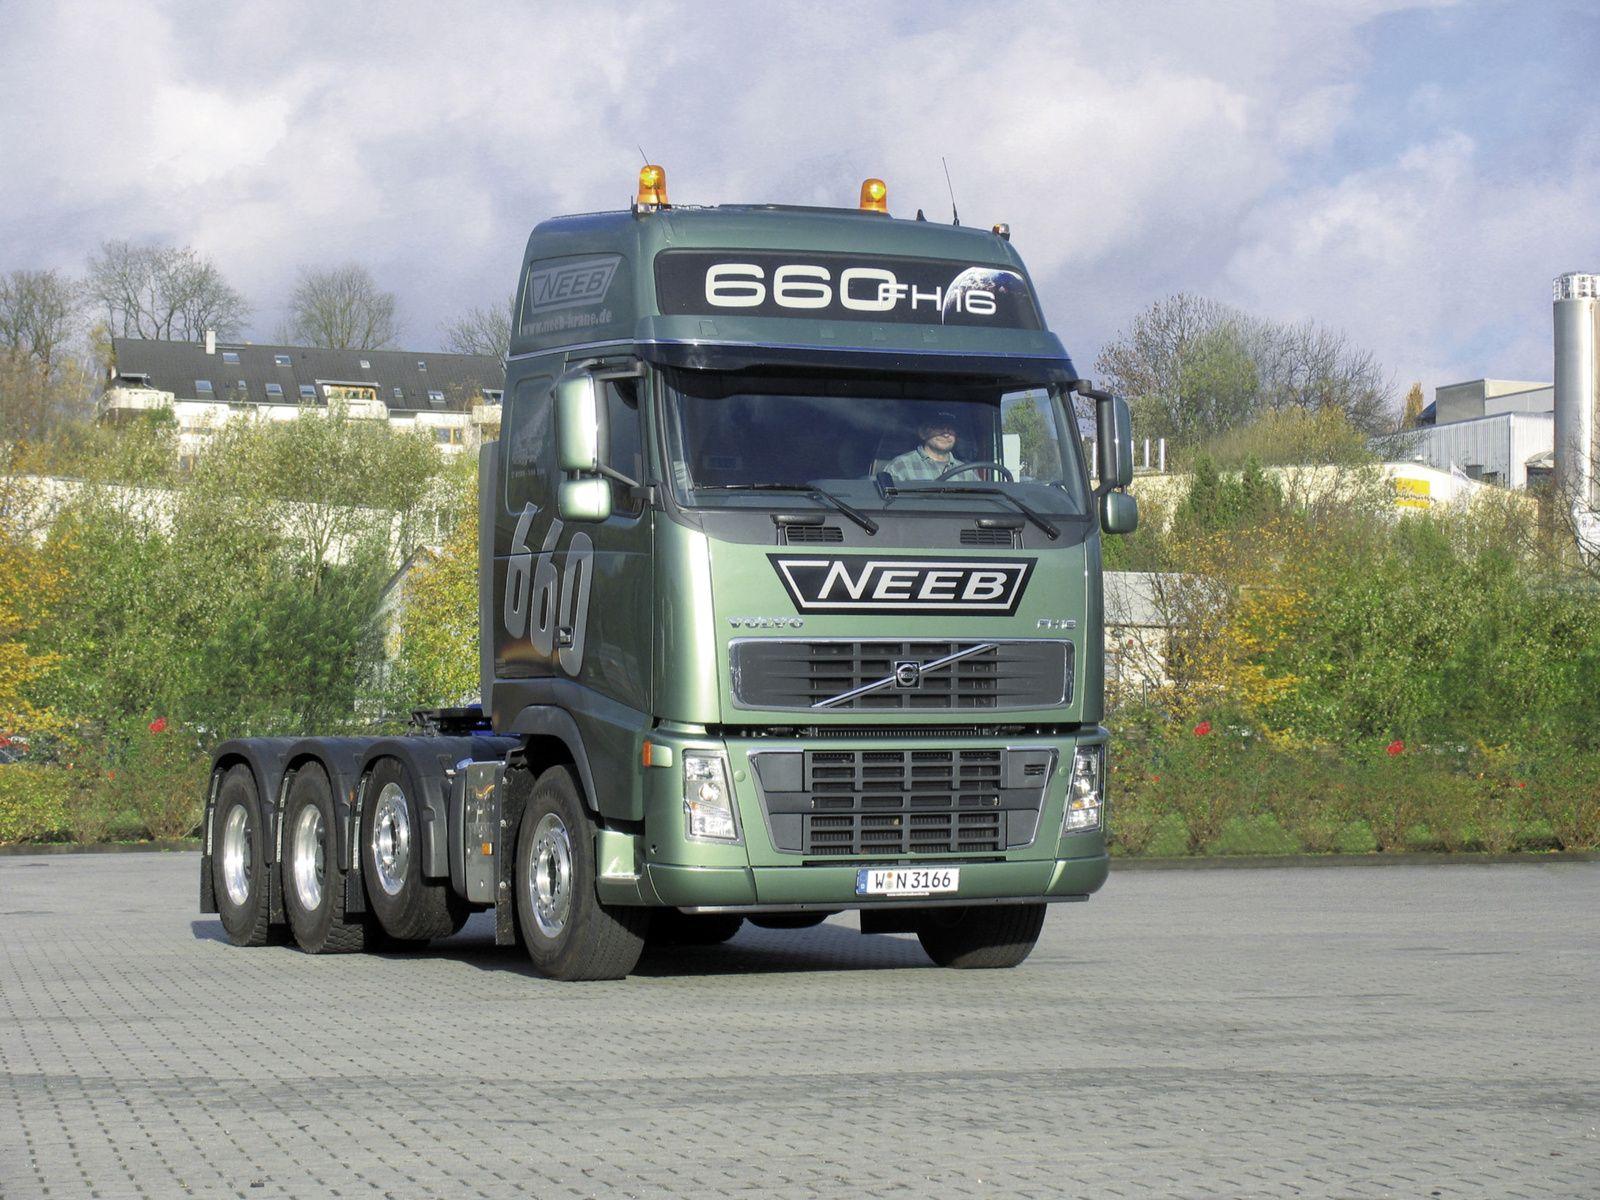 parts provided and used sale westoz arizona trucks for semi heavy salvage truck phoenix has volvo duty